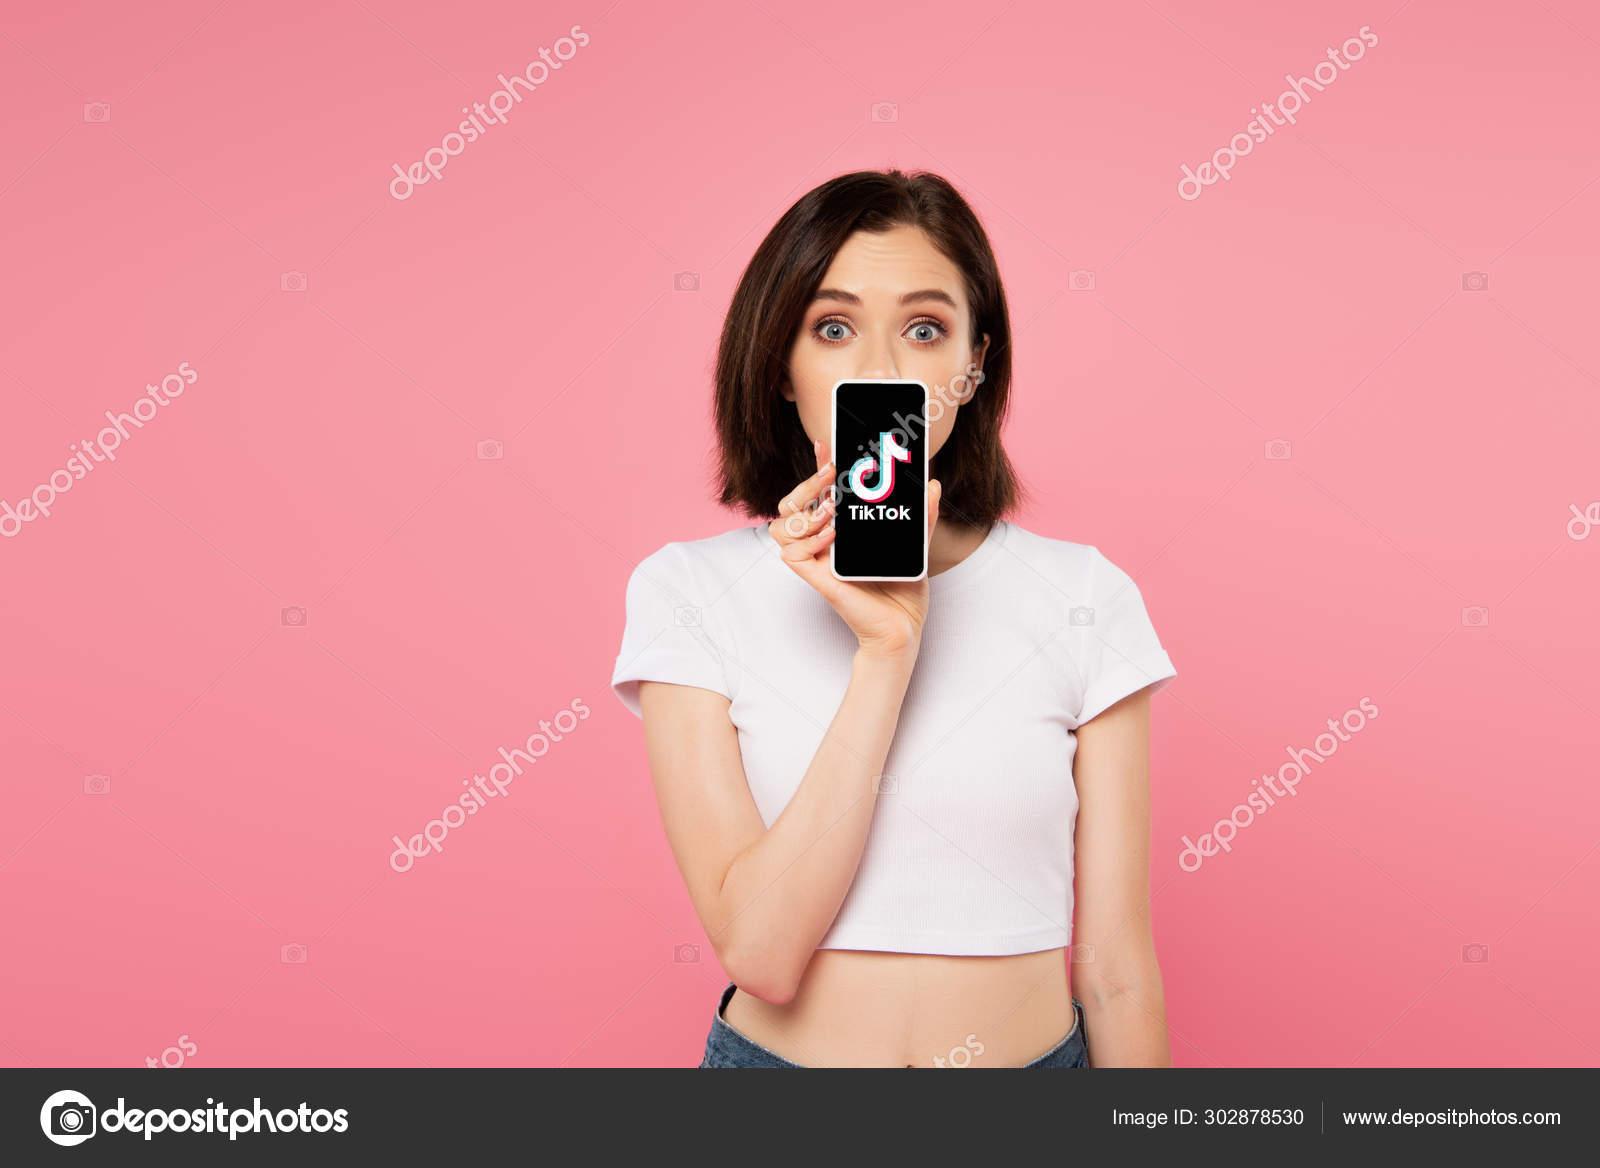 Kyiv Ukraine July 2019 Shocked Girl Holding Smartphone Tiktok Logo Stock Editorial Photo C Igorvetushko 302878530